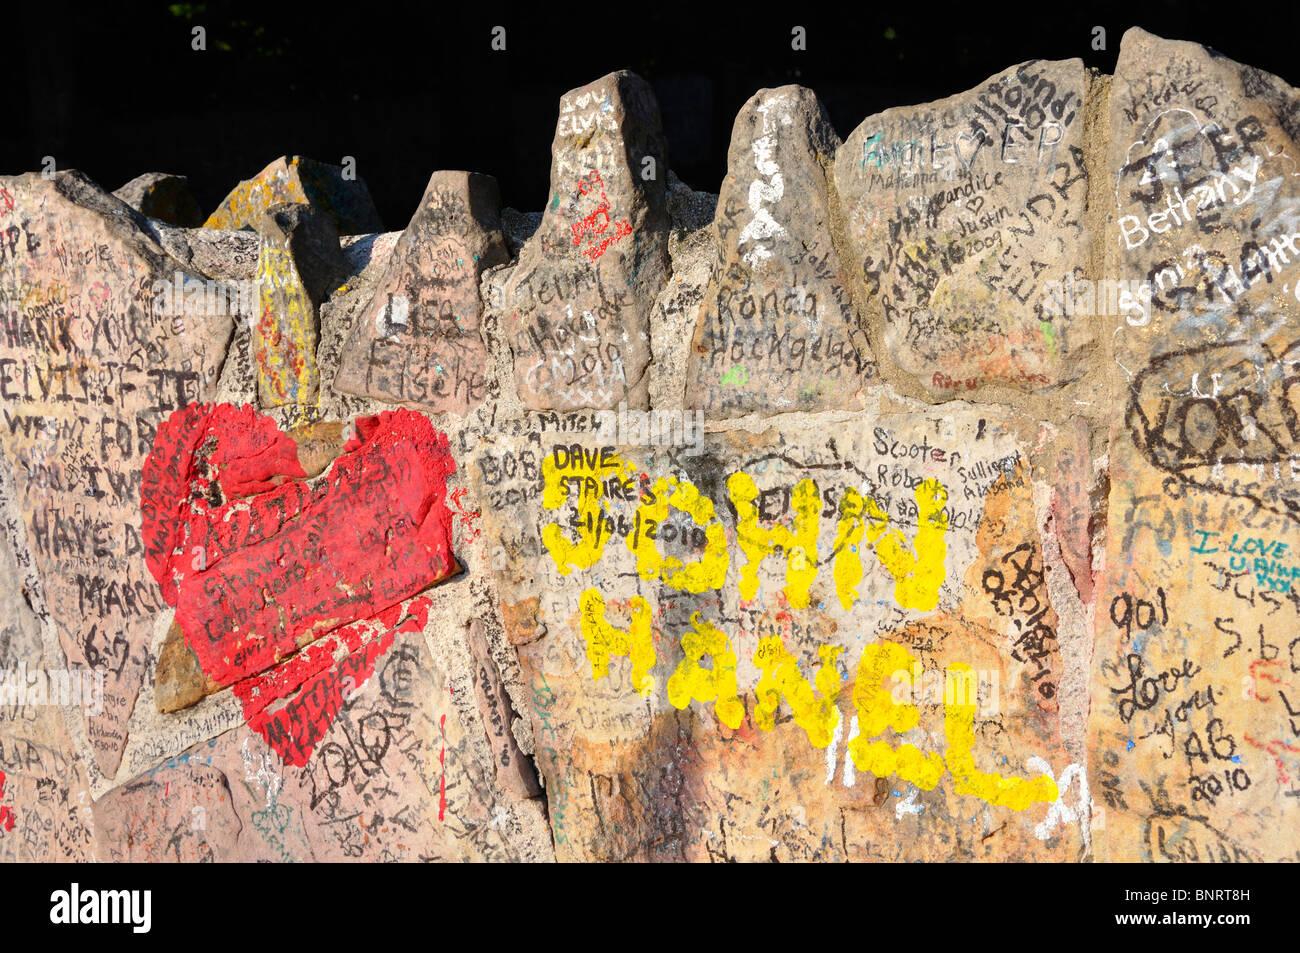 Wall Fans Writings Elvis Presley Stock Photos & Wall Fans Writings ...